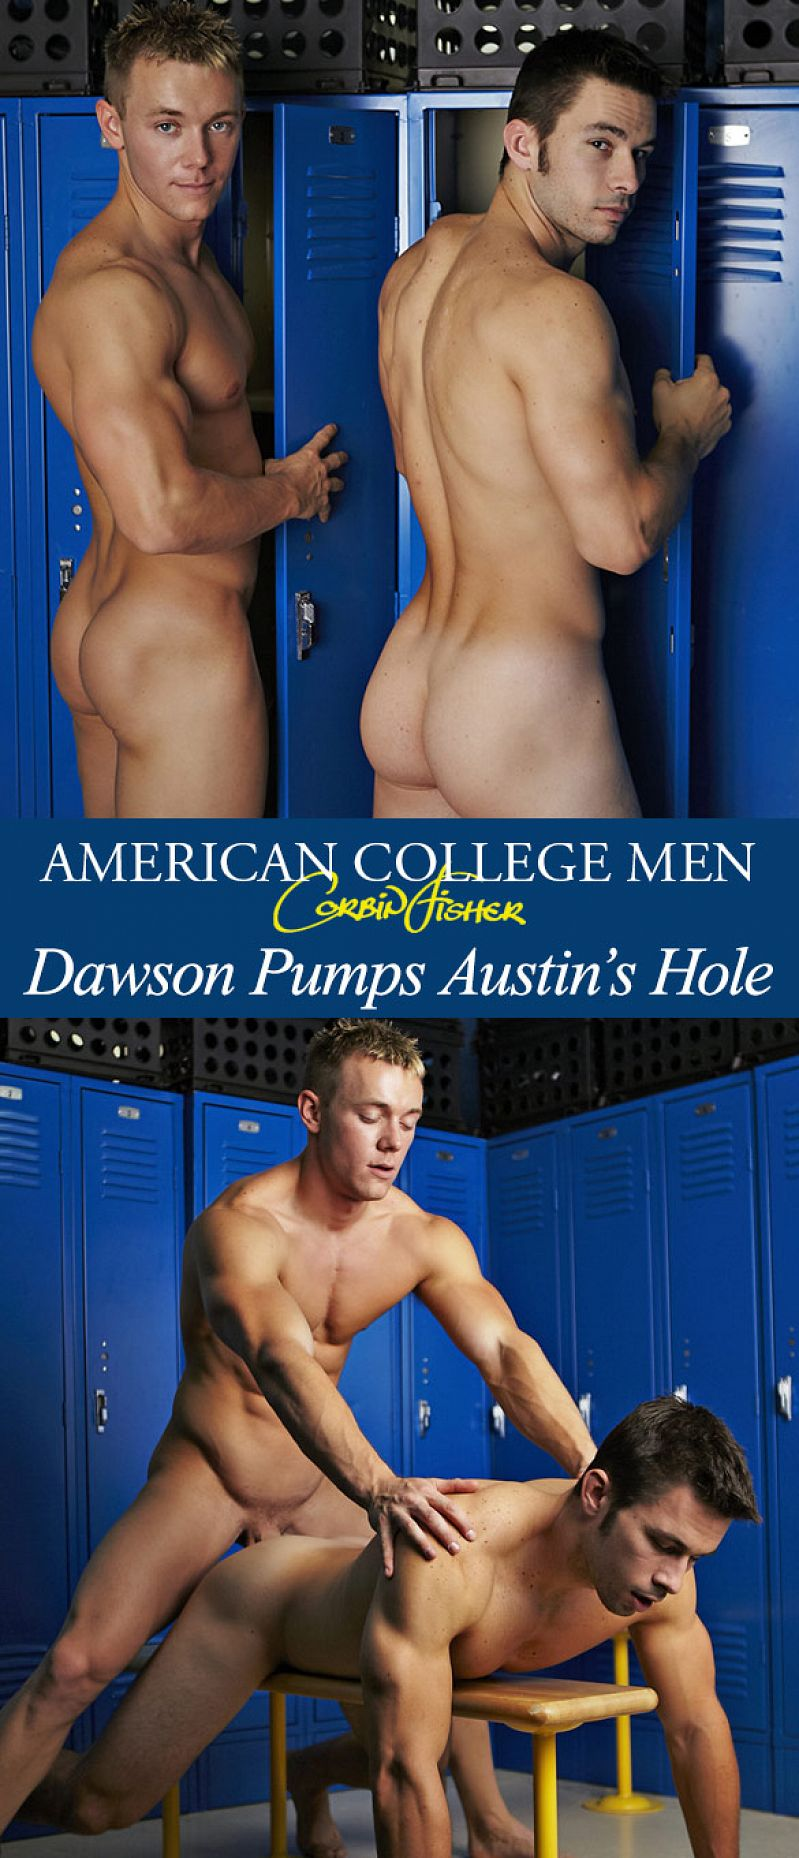 CorbinFisher – Dawson pumps Austin's hole bareback